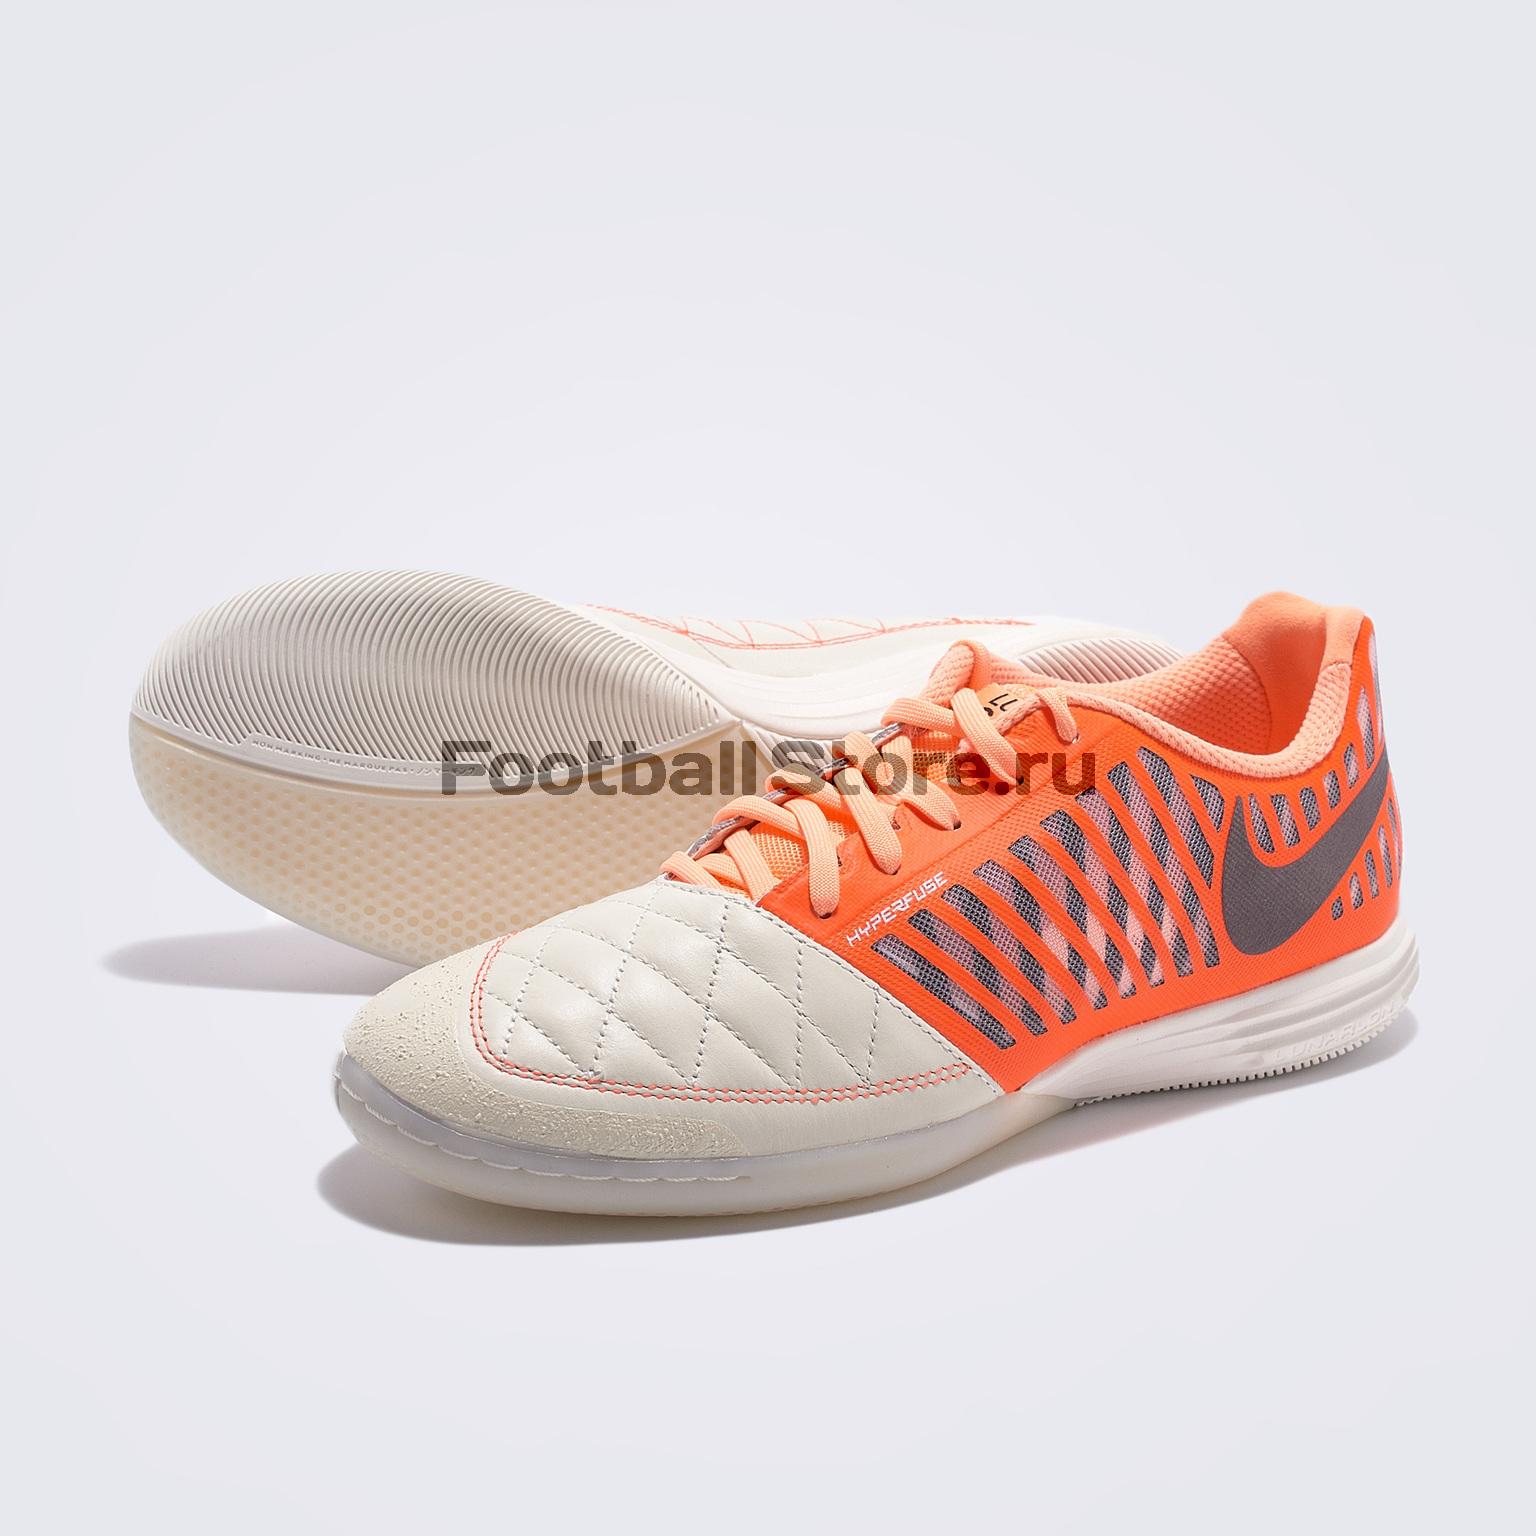 Футзалки Nike LunarGato II 580456-128